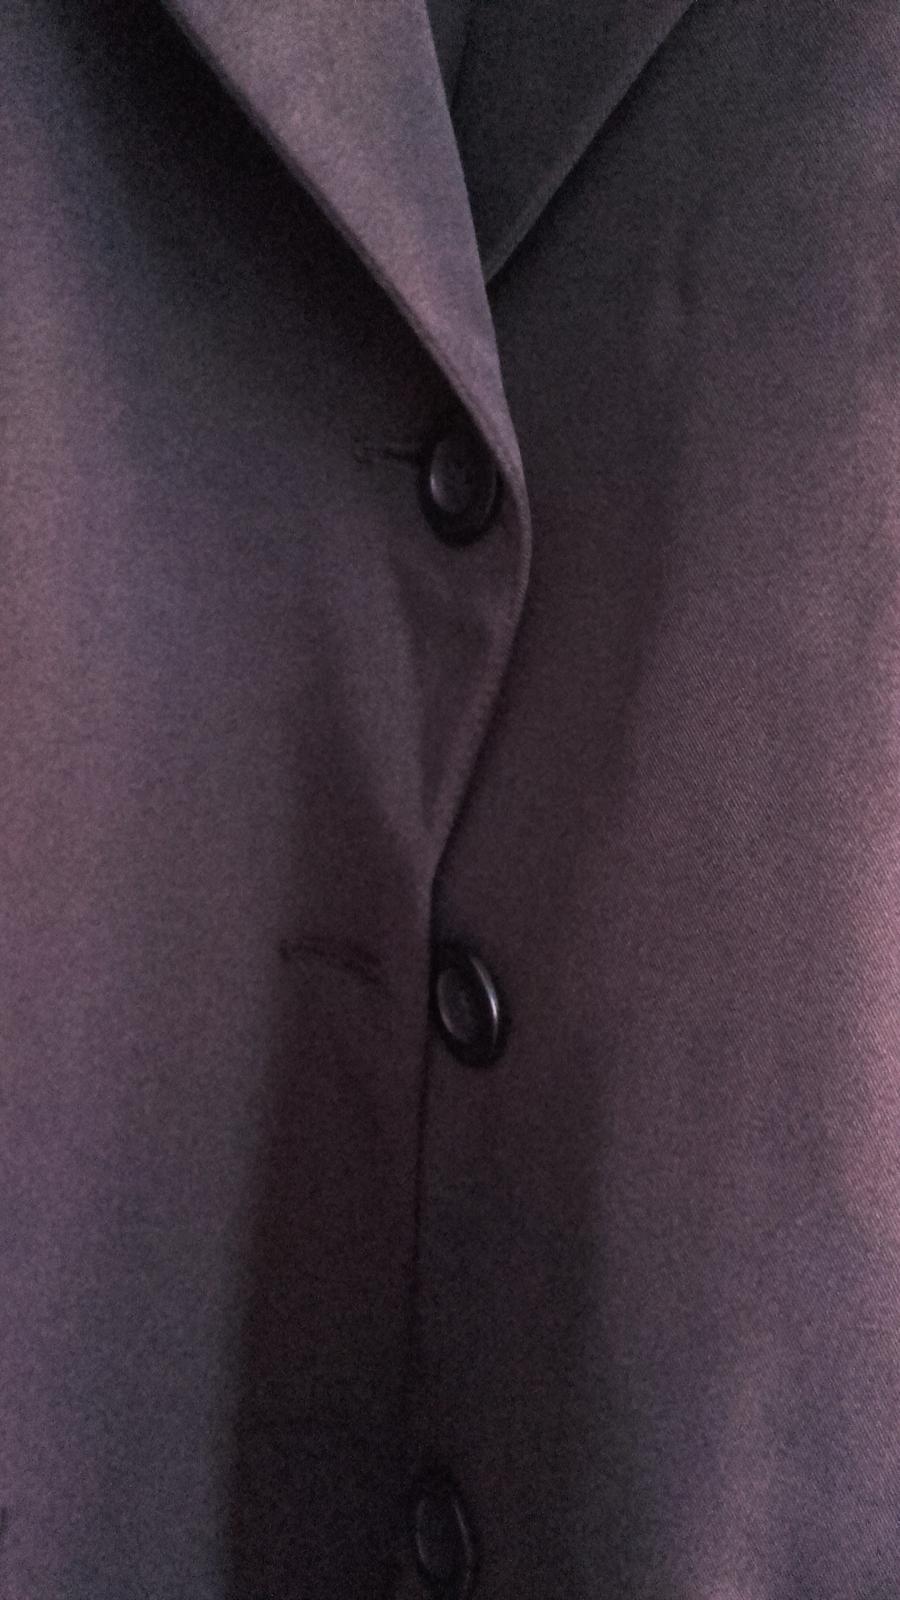 Čierne sako - Obrázok č. 3